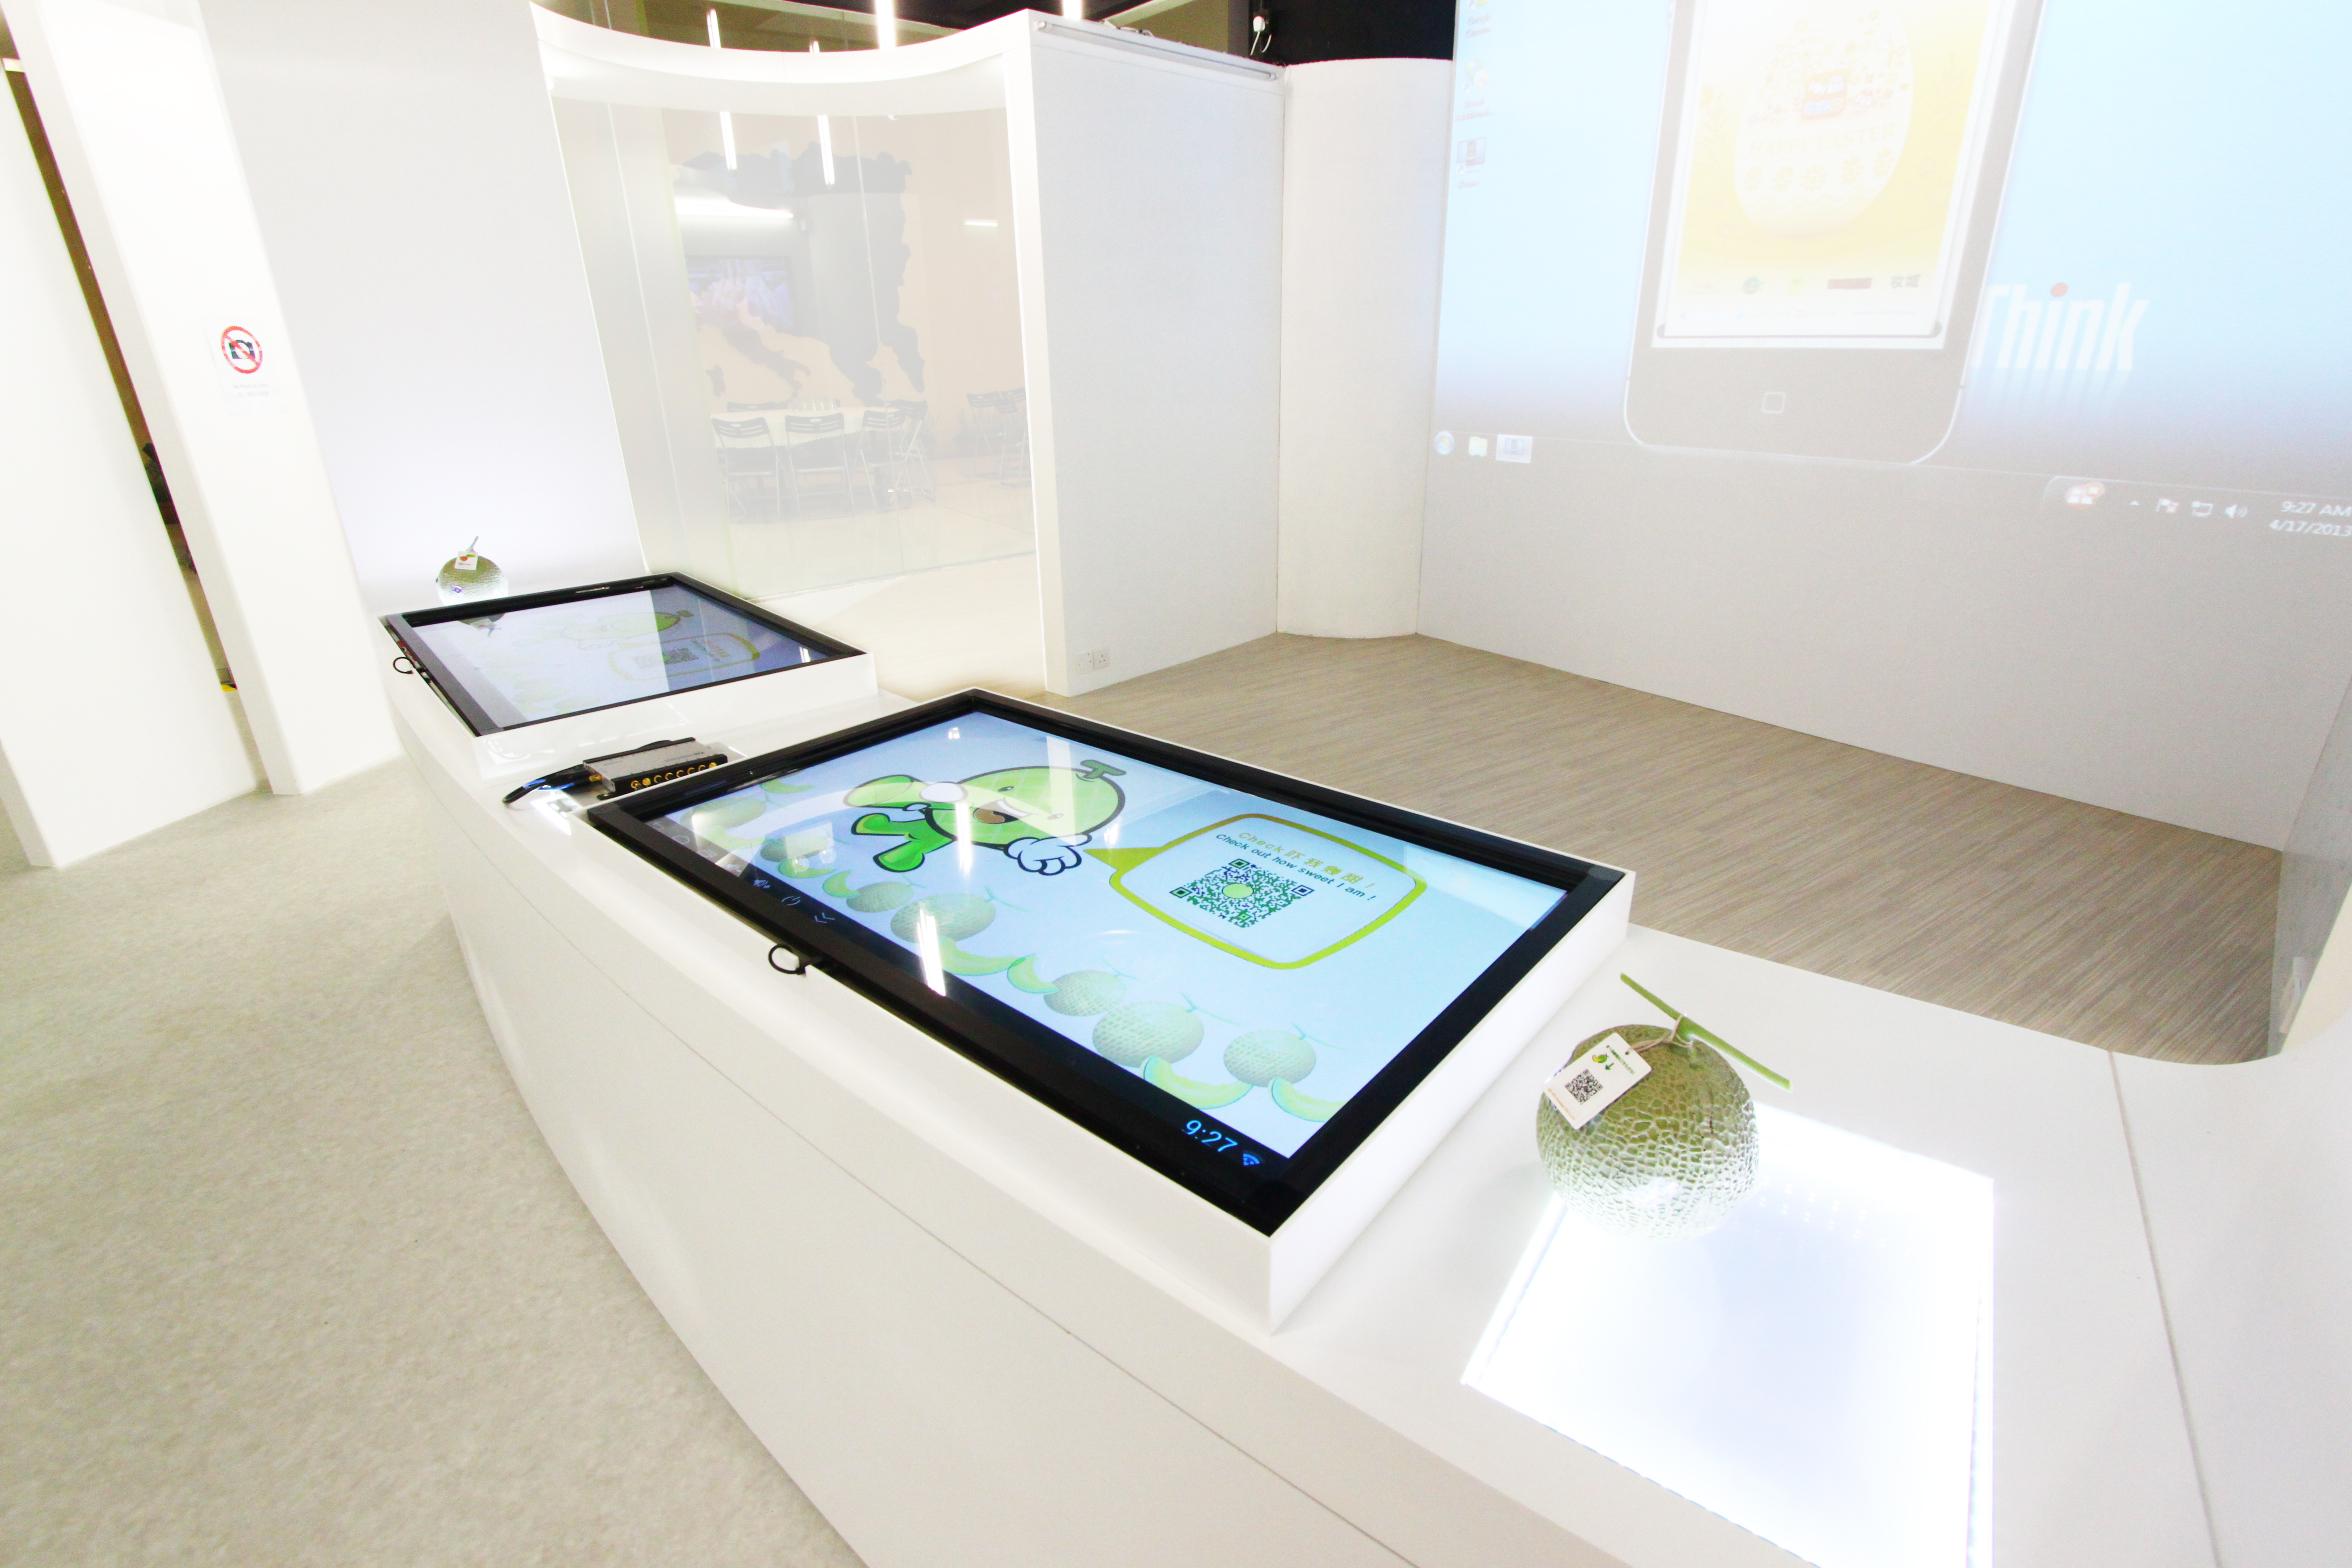 Science Park/ IoT Centre/ Zone1